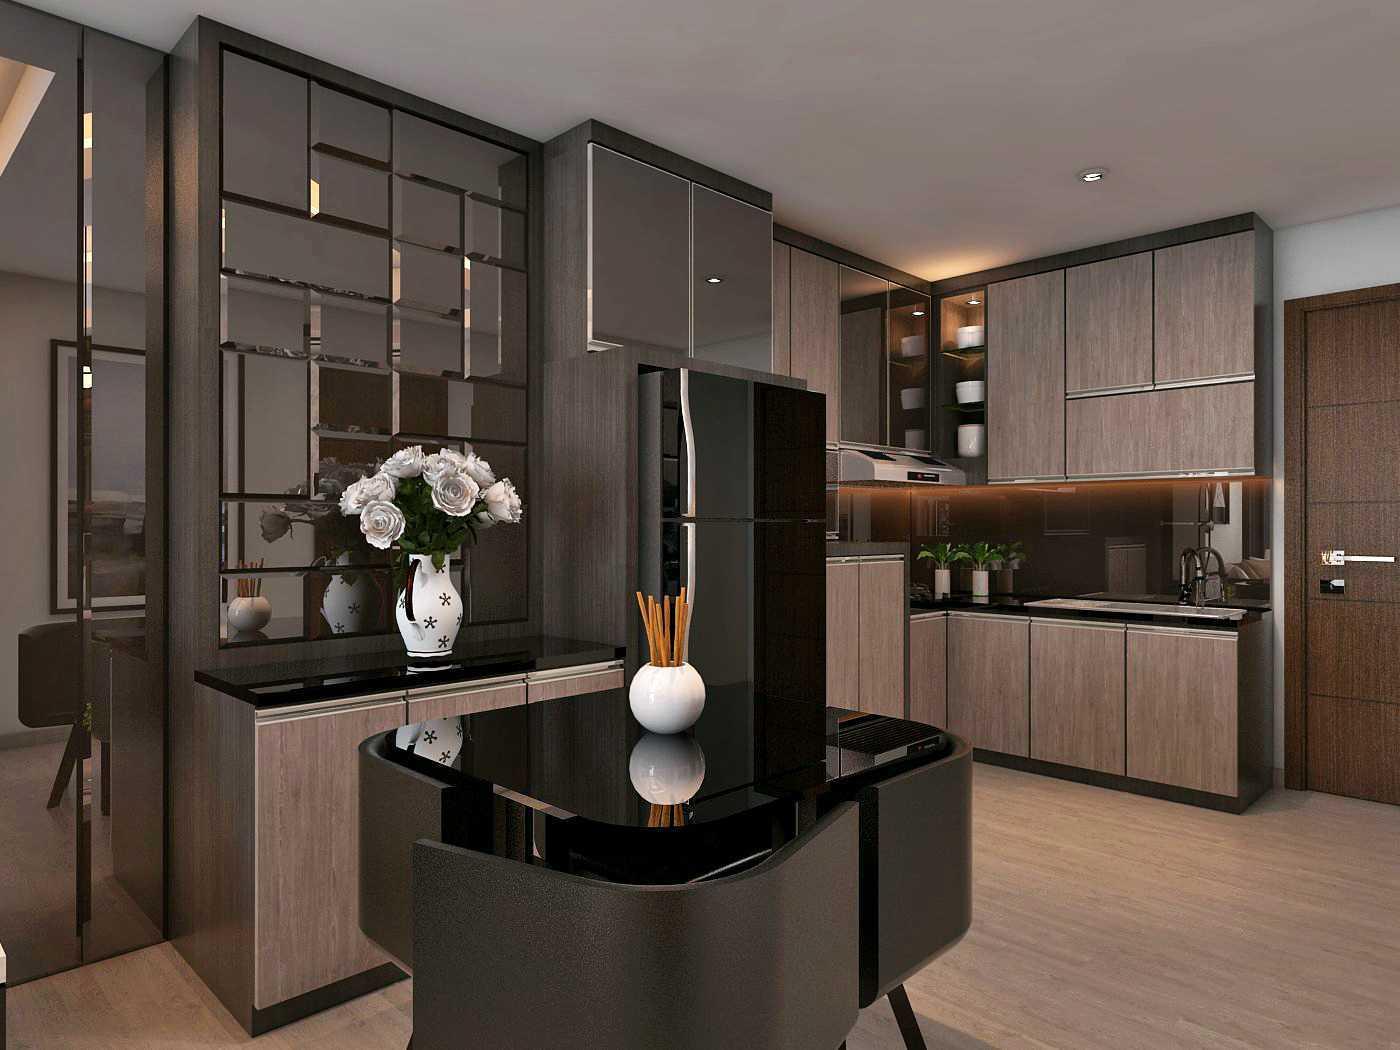 Habibullah Alfatih Condominium - Greenbay Pluit Jakarta, Indonesia Jakarta, Indonesia Dapur Kontemporer 35915